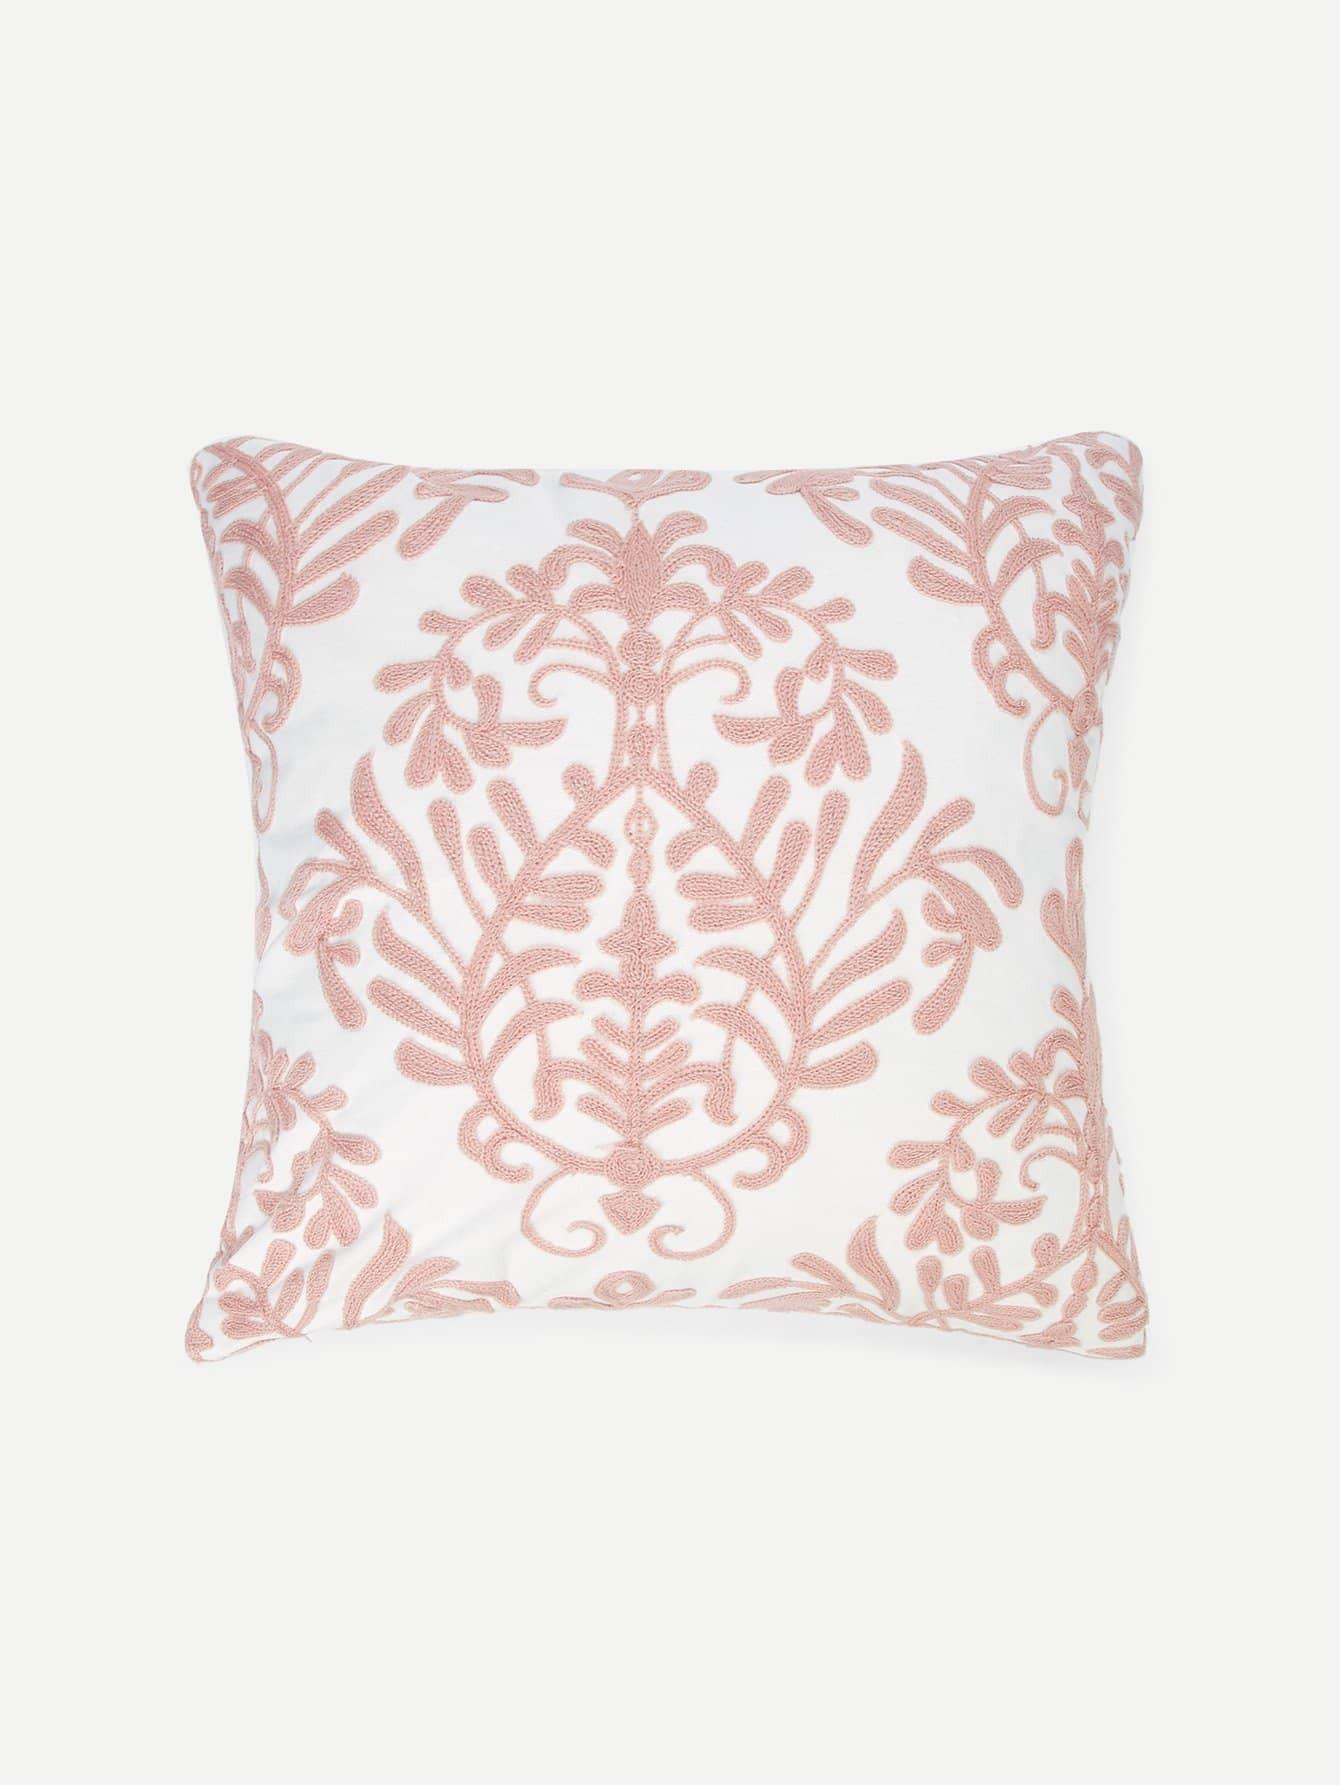 Купить Наволочка для подушка вышивка цветы 1 шт, null, SheIn